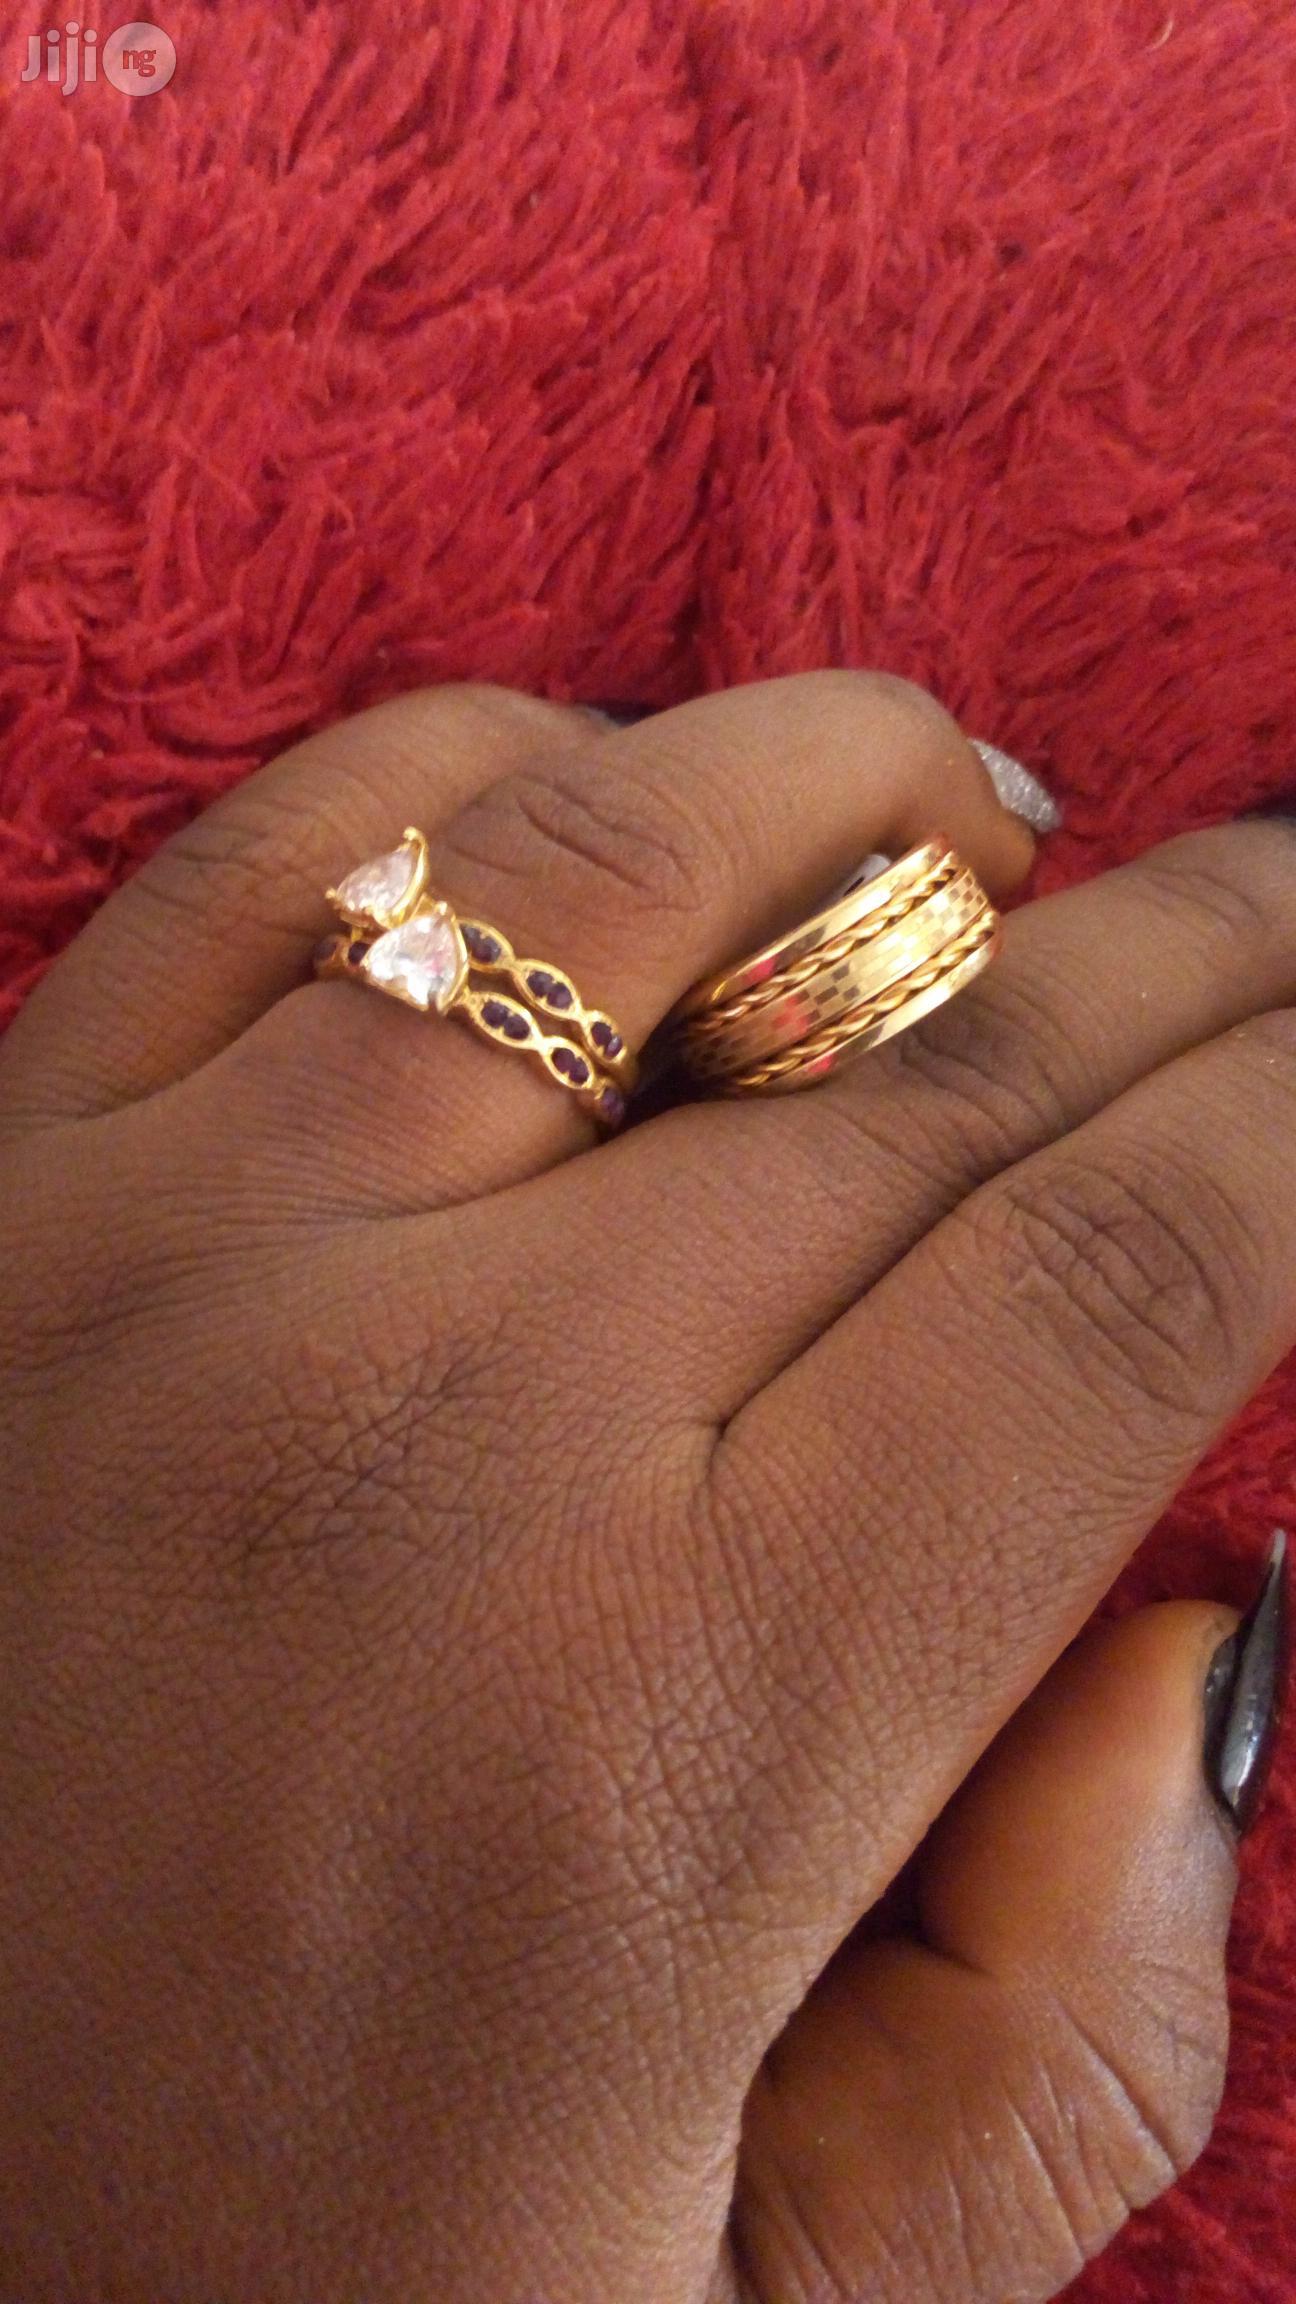 Wedding Ring   Wedding Wear & Accessories for sale in Alimosho, Lagos State, Nigeria